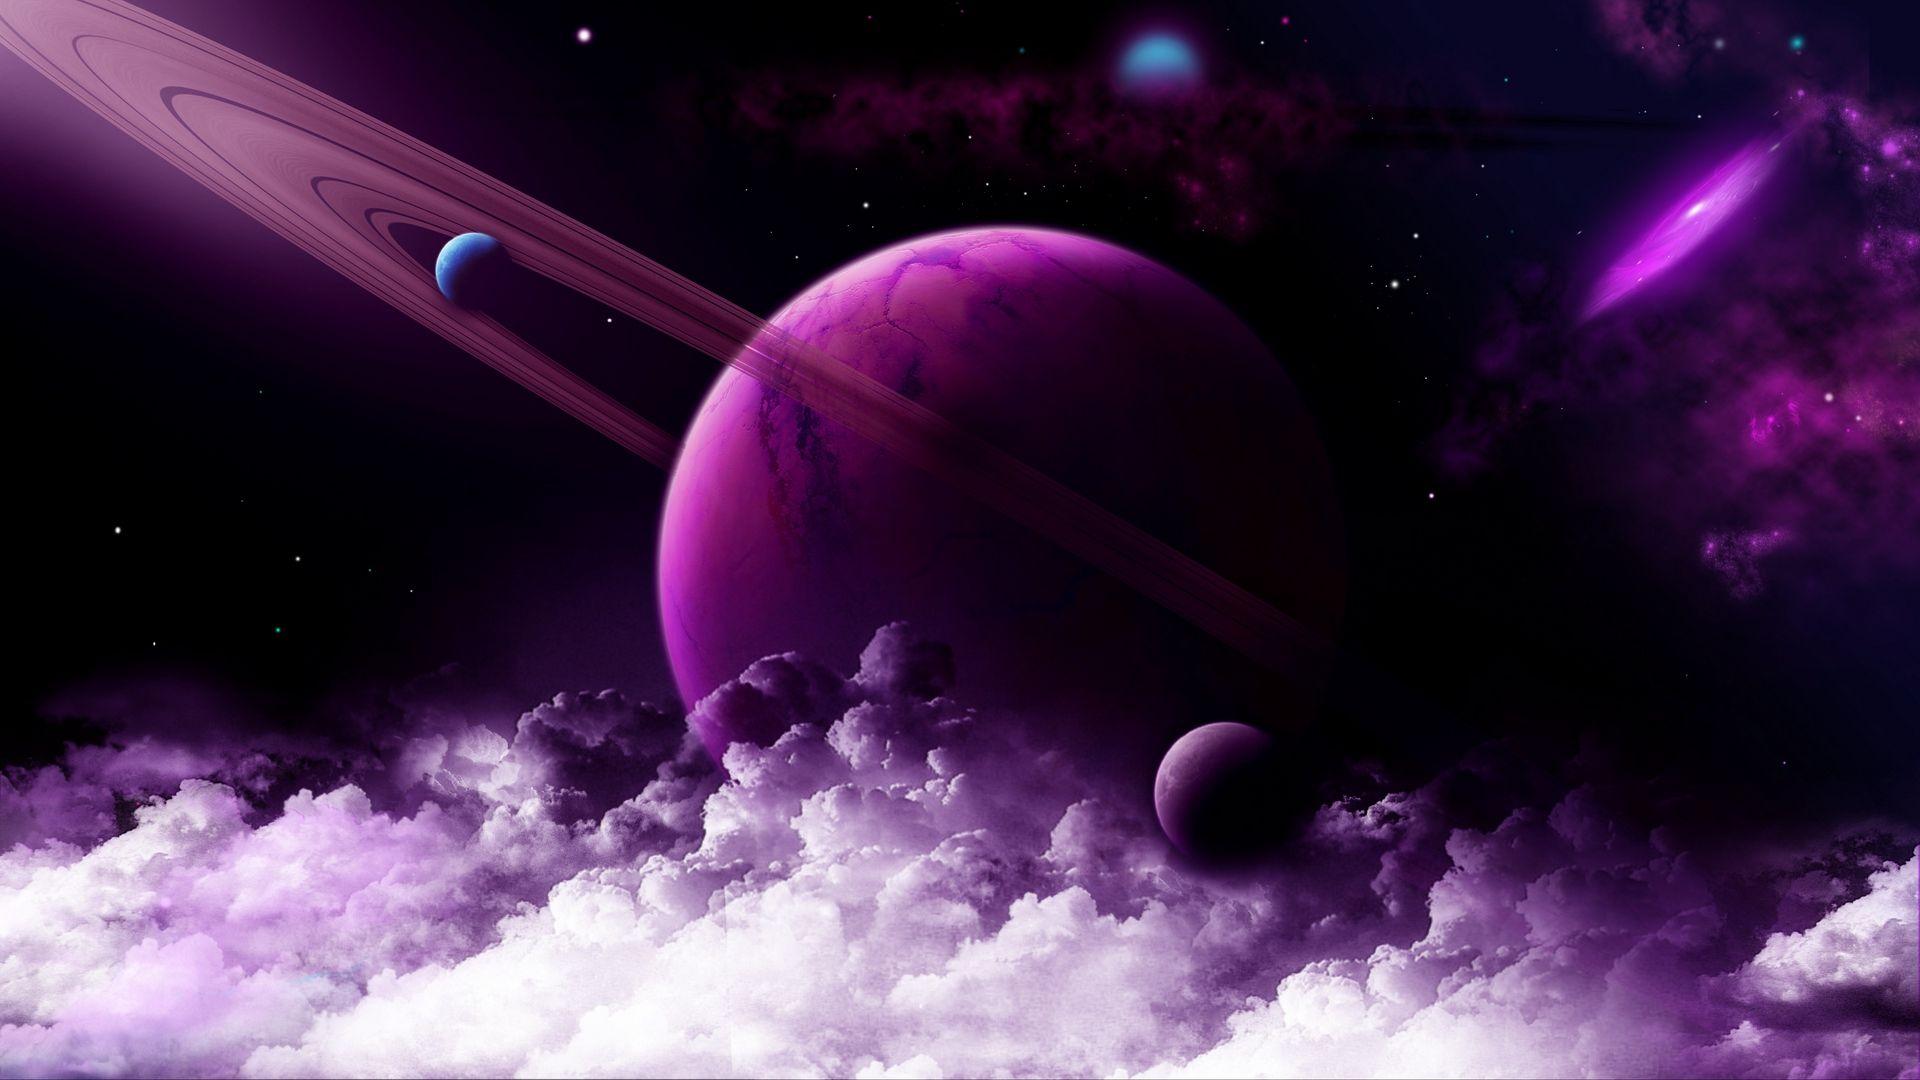 Outer Space Free Desktop Wallpaper